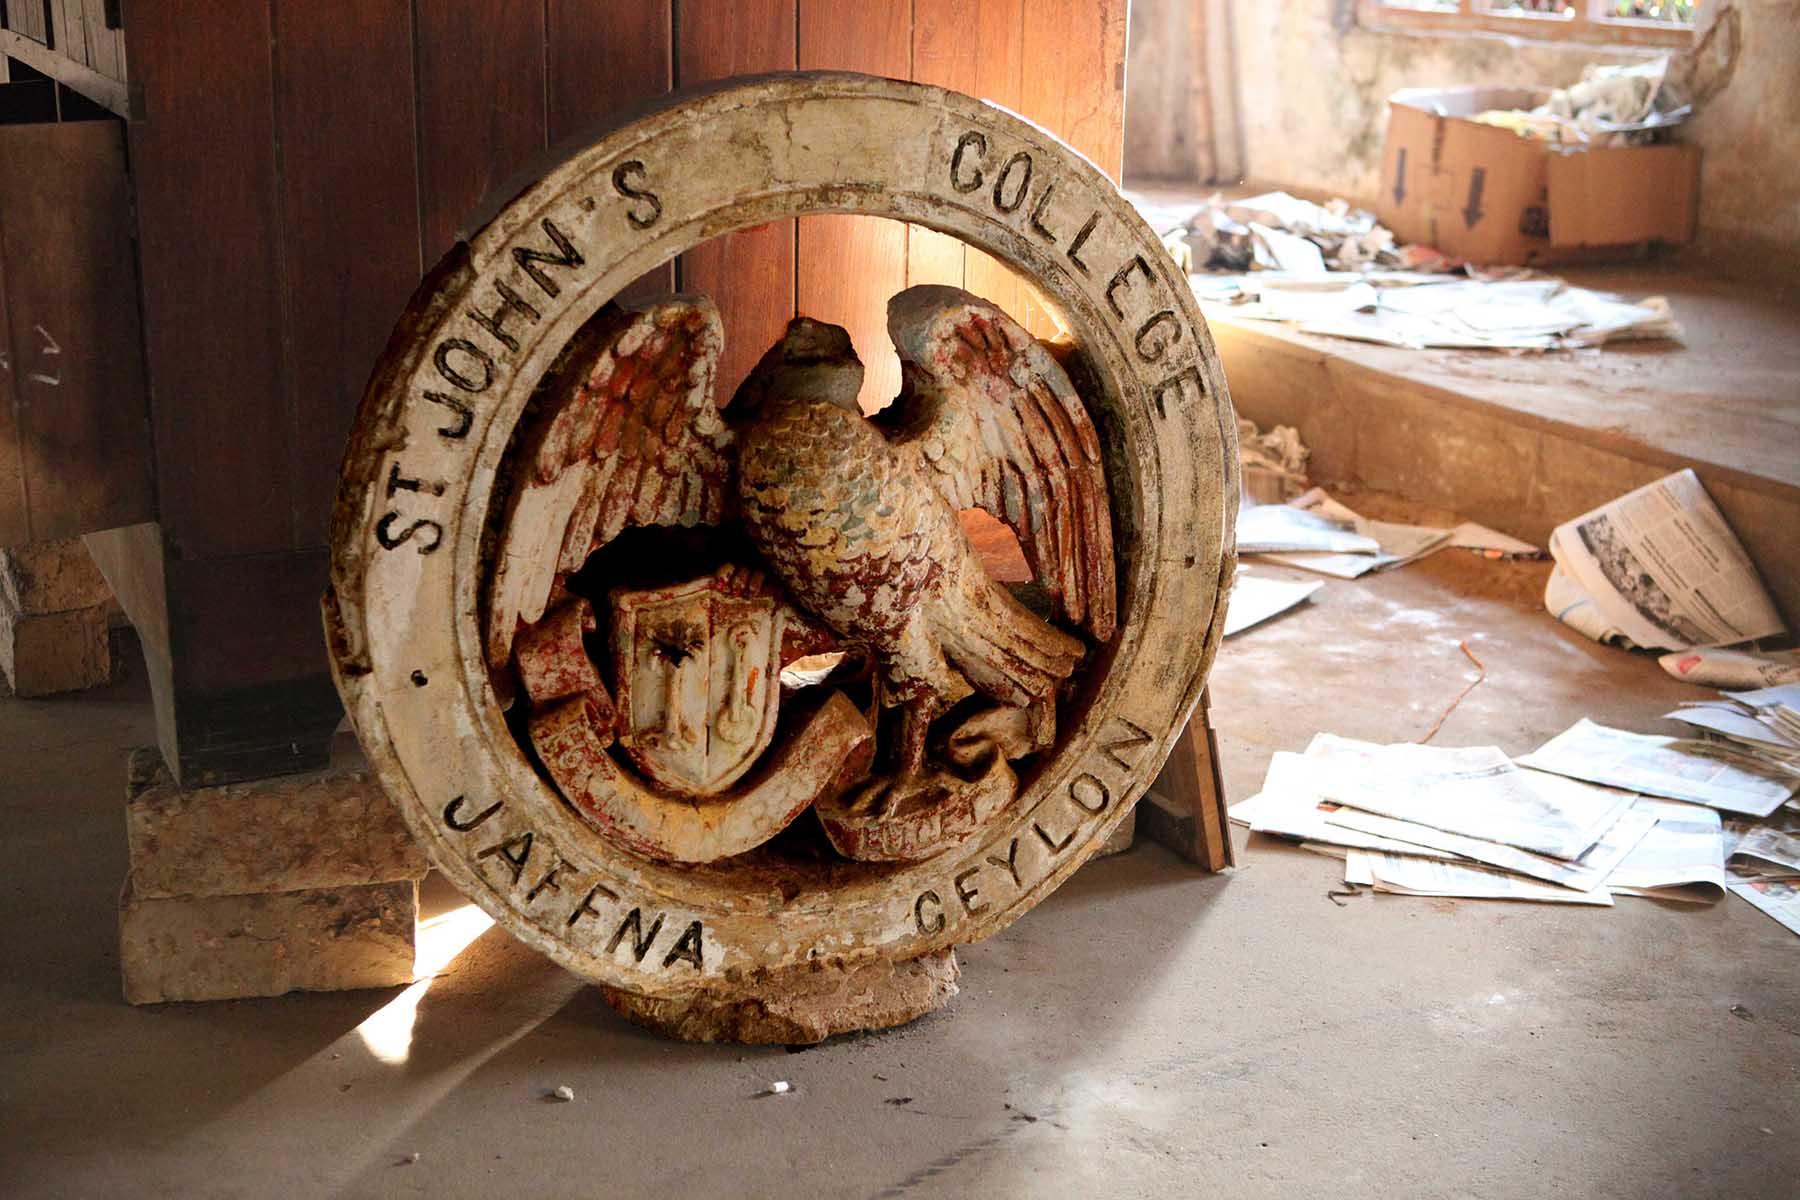 St-John_s-Crest-20120204_1819-copy-copy